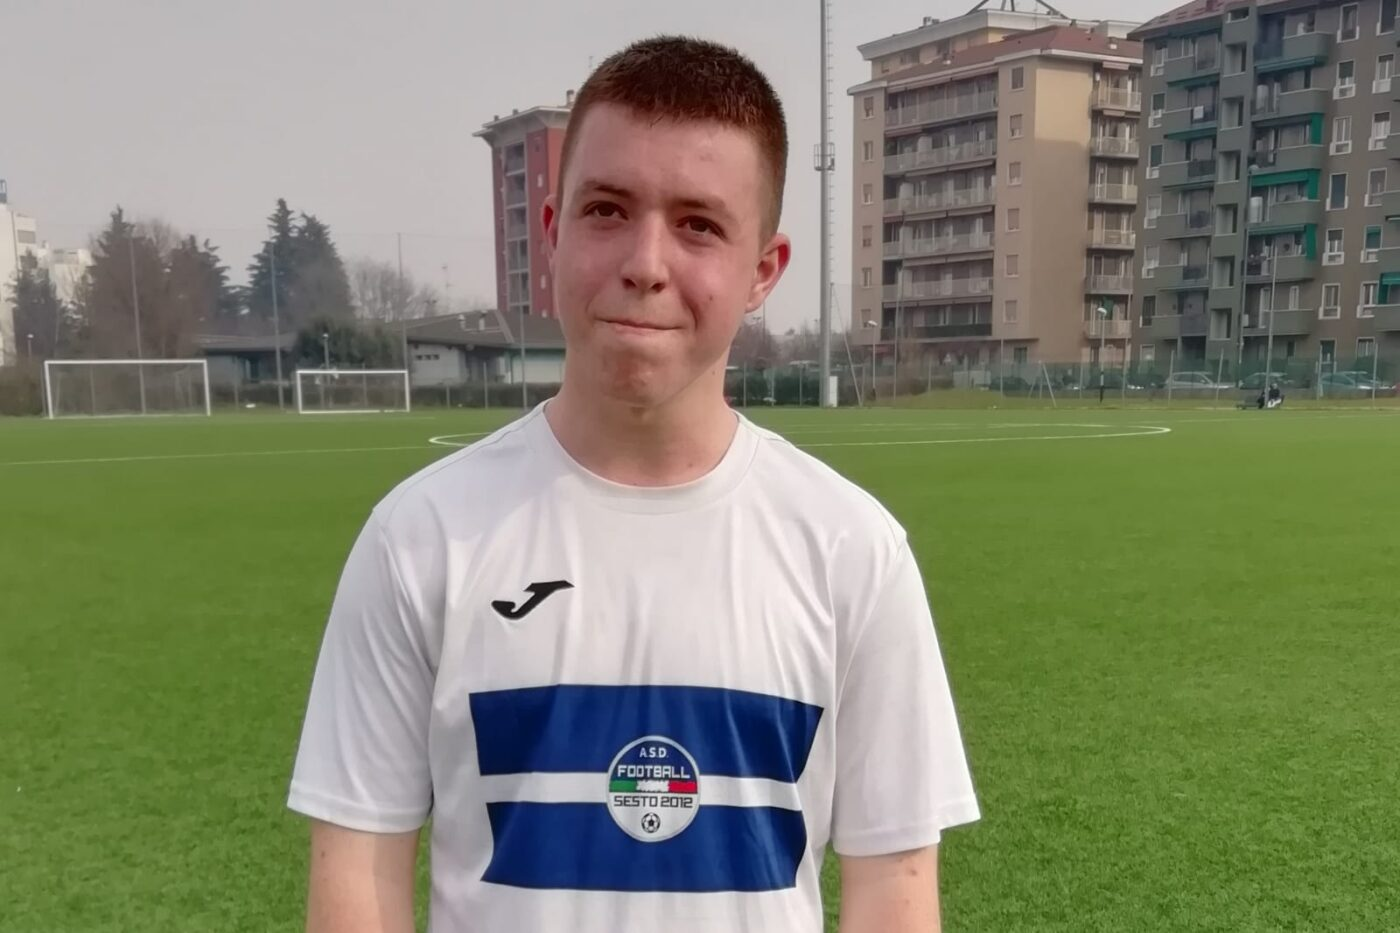 Sesto 2012 - Orpas Under 17 Milano: Andrea Fadda (Sesto 2012)